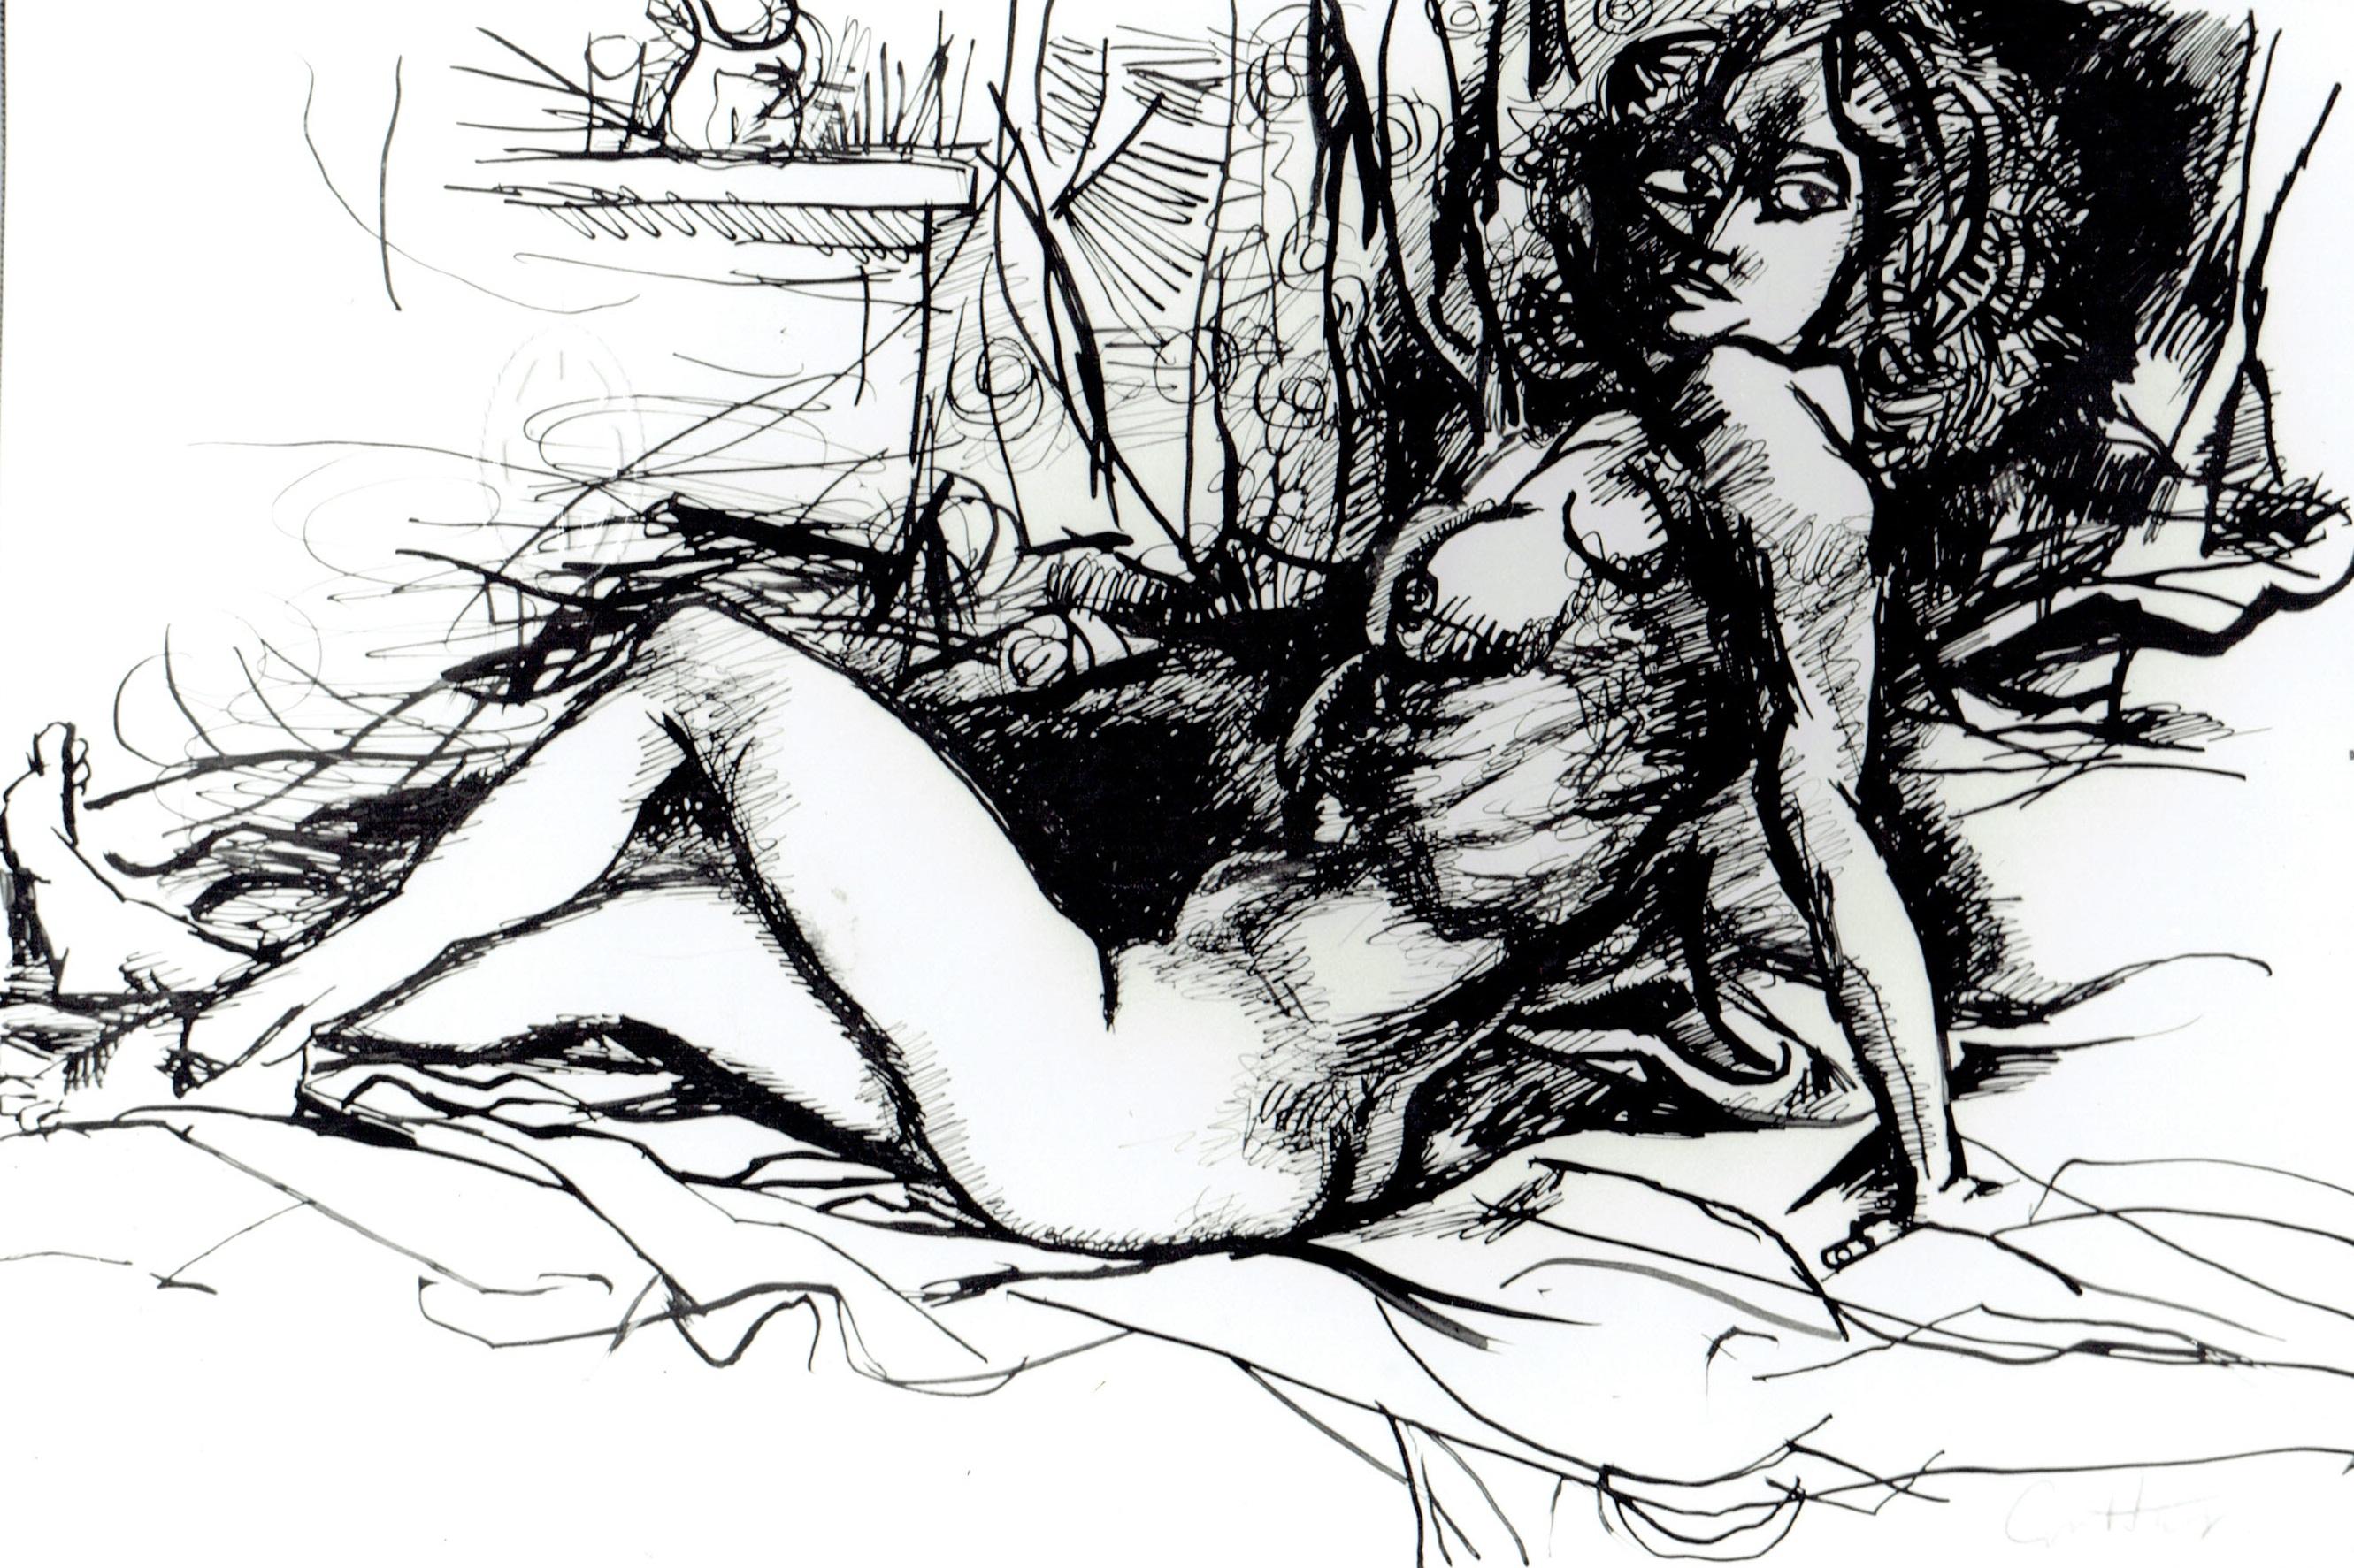 Renato Guttuso, Nudo